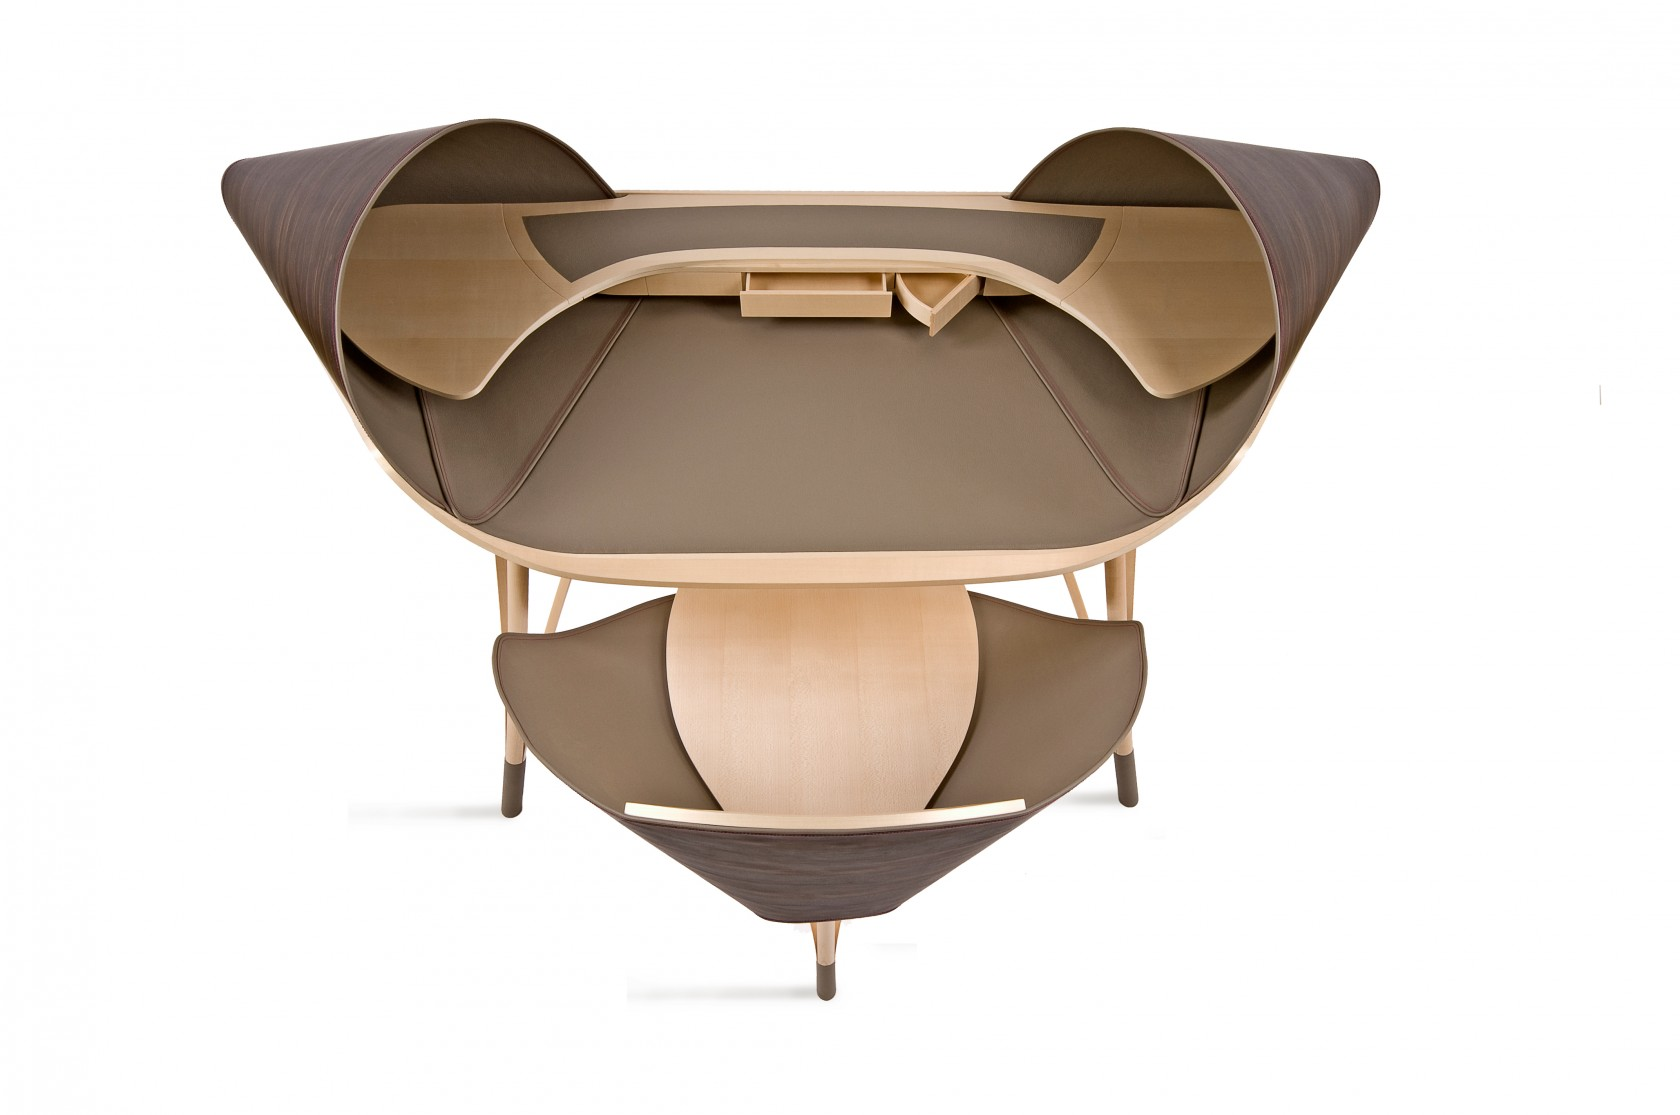 bureau elytre ludovic avenel b niste cr ateur paris. Black Bedroom Furniture Sets. Home Design Ideas